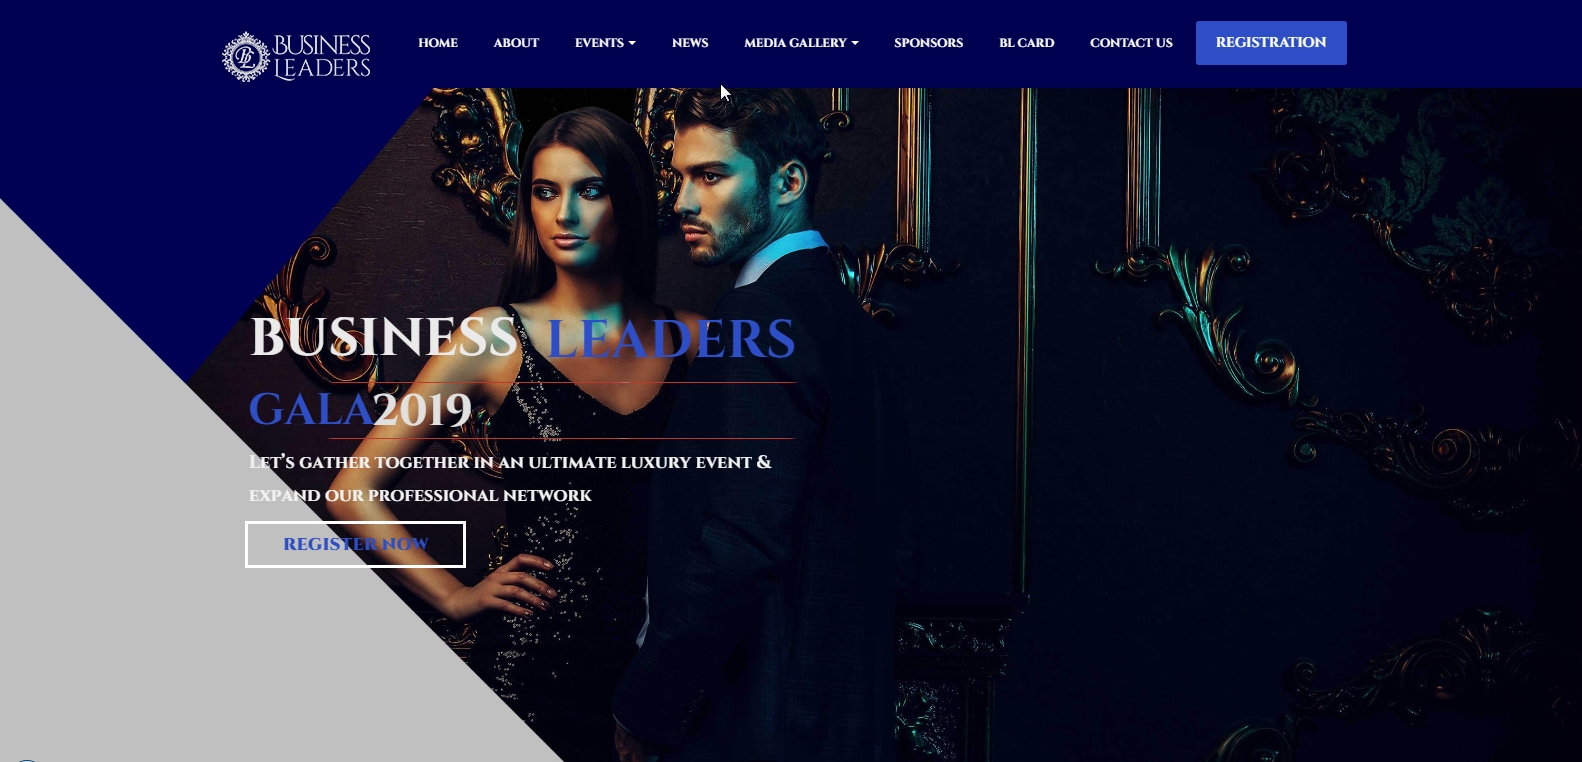 screenshot 20190513 171515 - BUSINESSLEADERS.CA